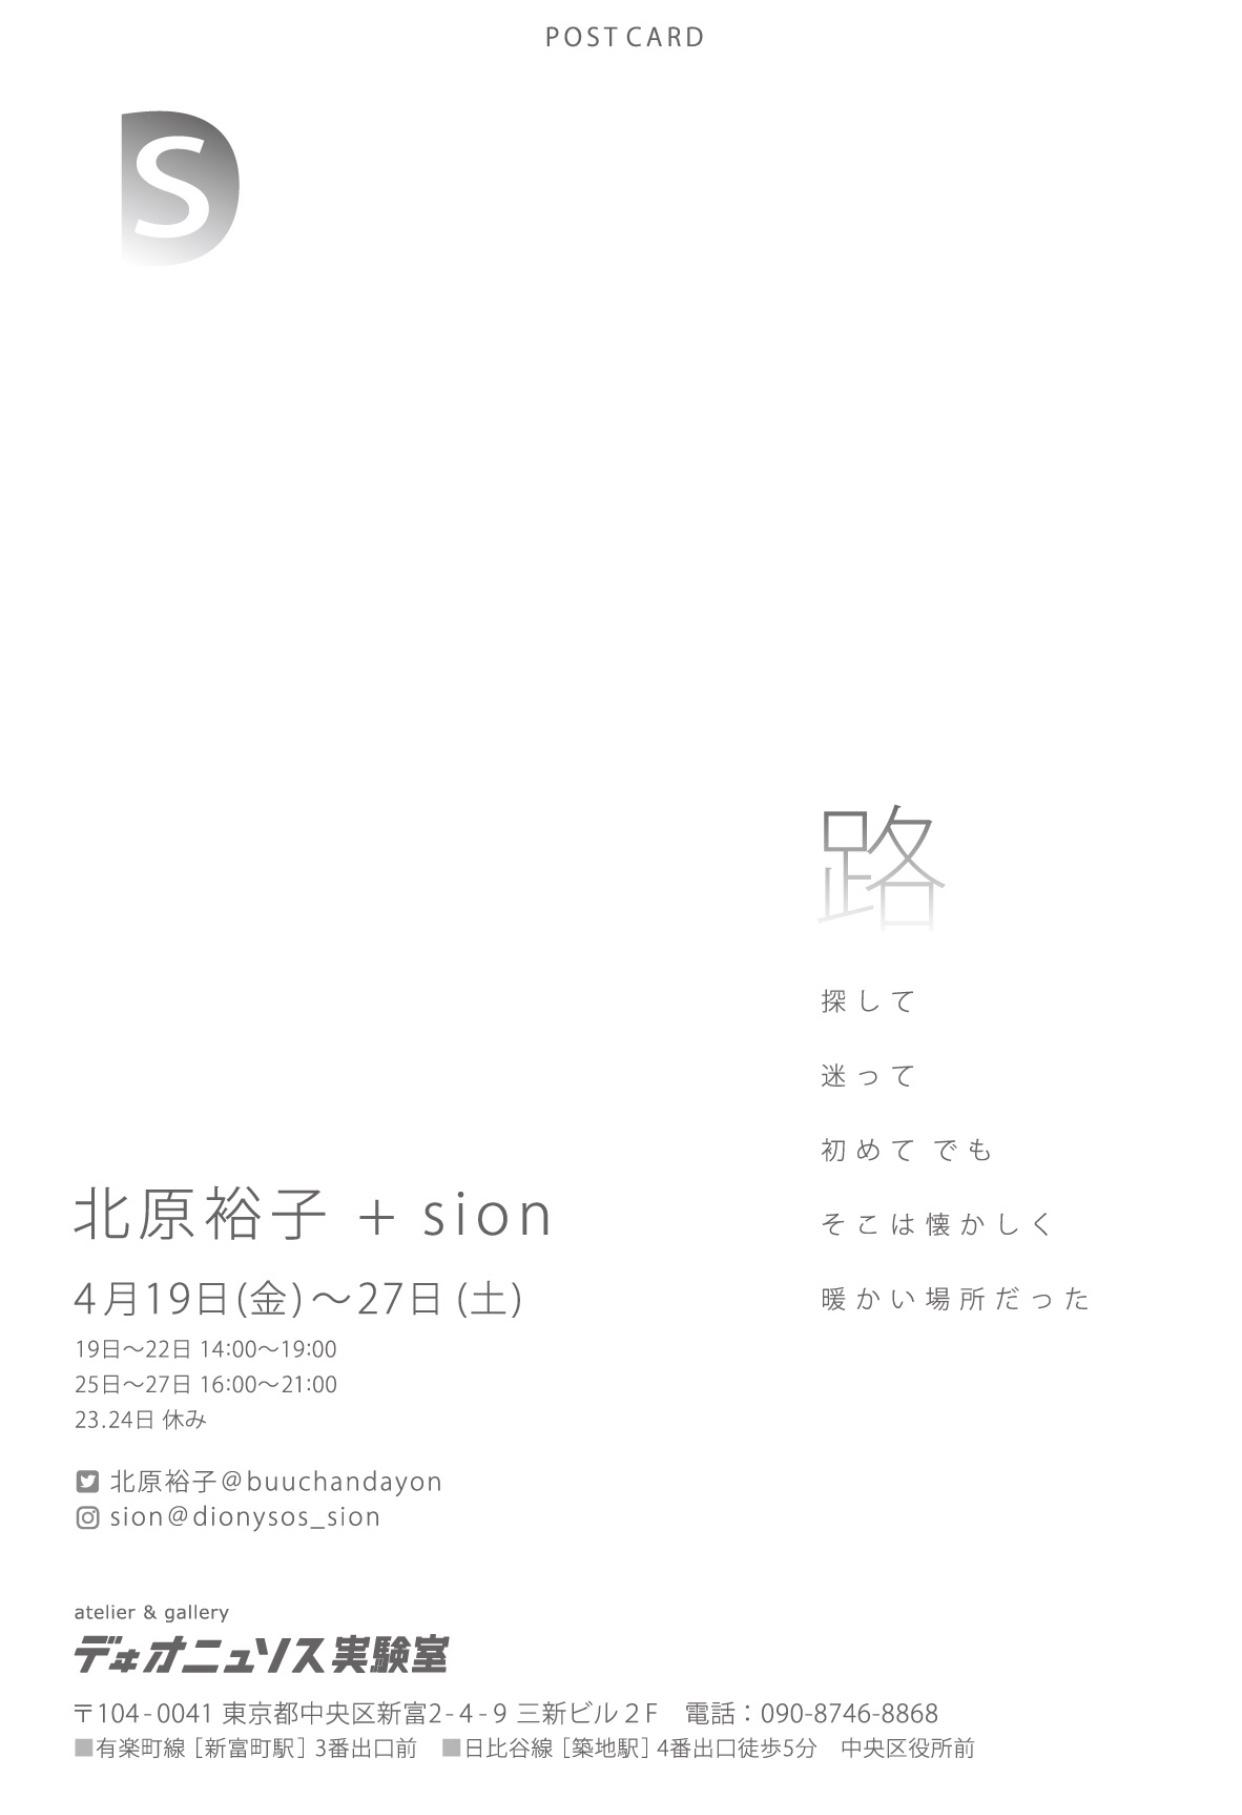 sionさんと二人展《路》開催します@新富町ディオニュソス実験室_a0137727_14450660.jpeg